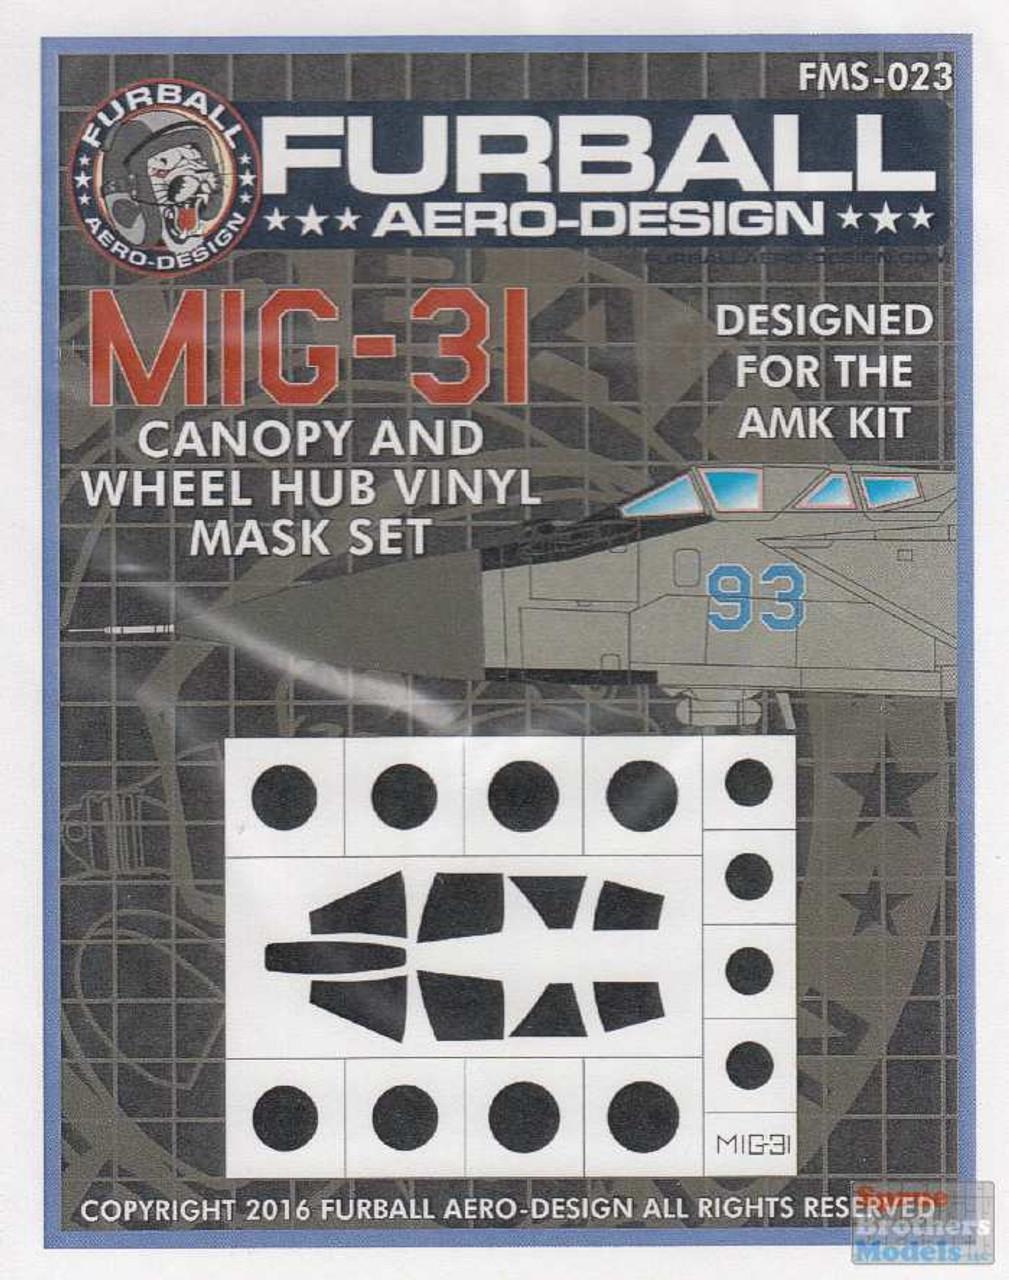 FURFMS023 1:48 Furball Aero Design Canopy and Wheel Hub Vinyl Mask Set for MiG-31 Foxhound (AMK kit)